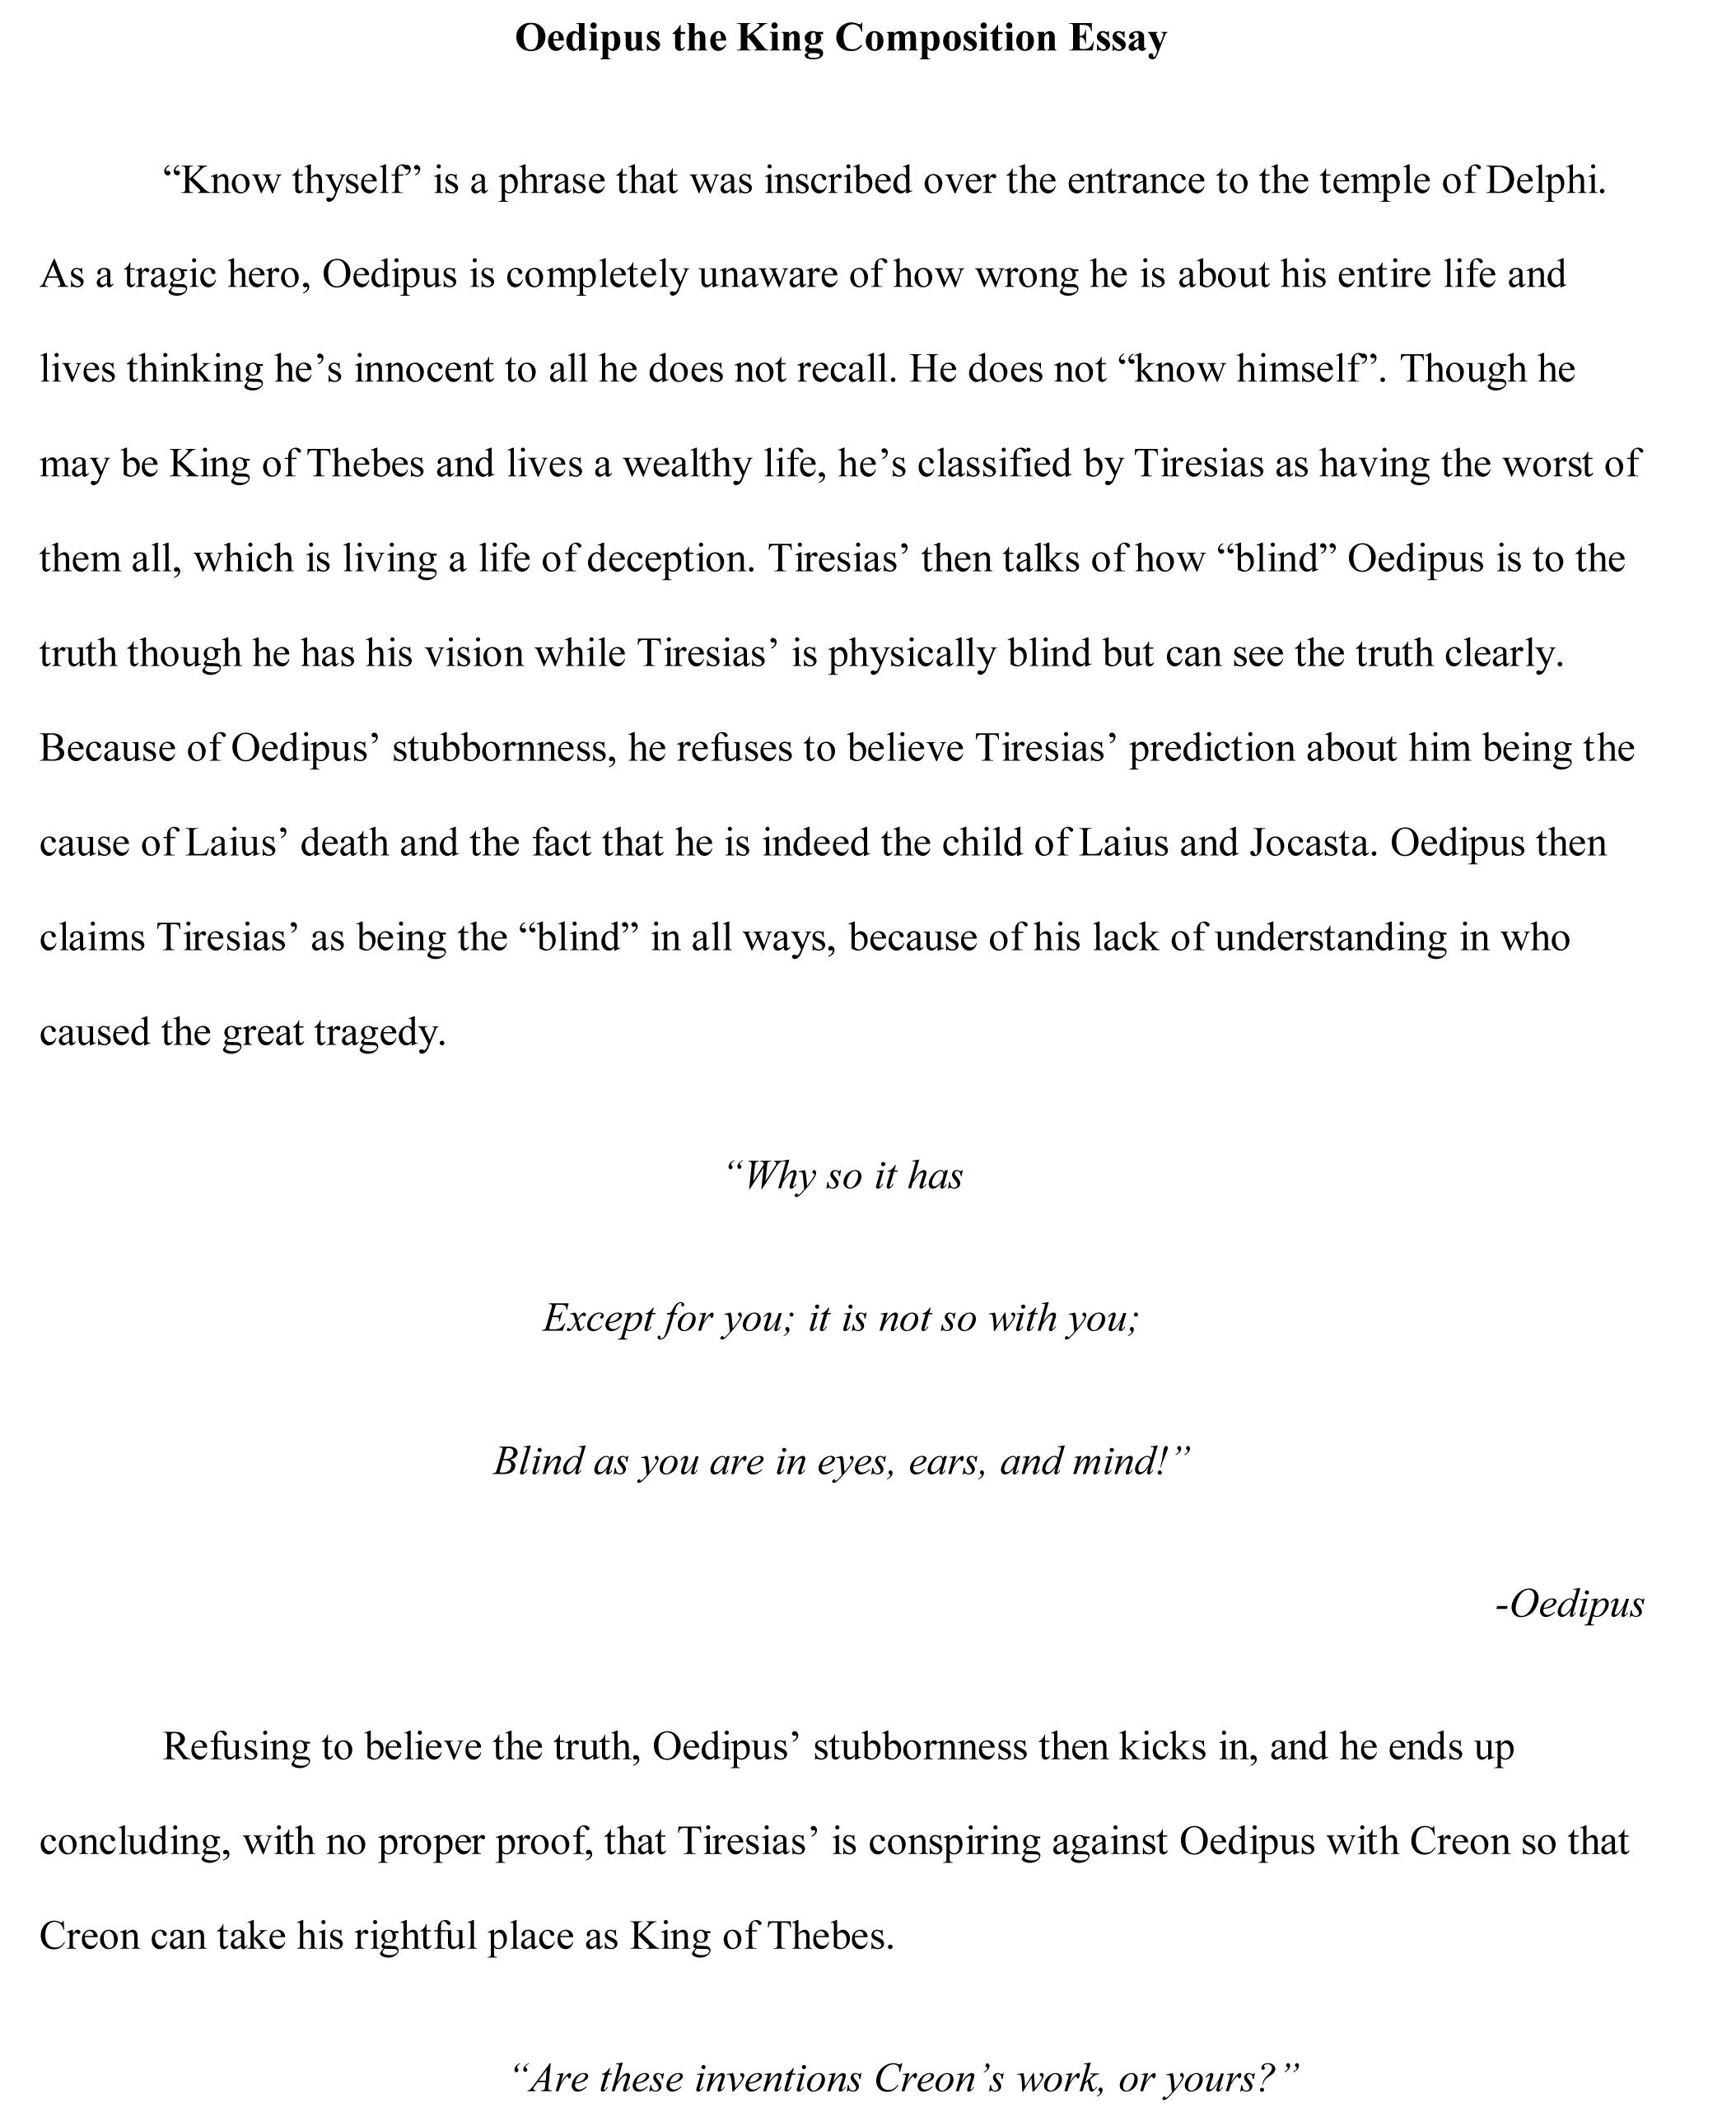 023 Good Essay Hooks Oedipus Free Sample Rare Generator Best Ever College Full